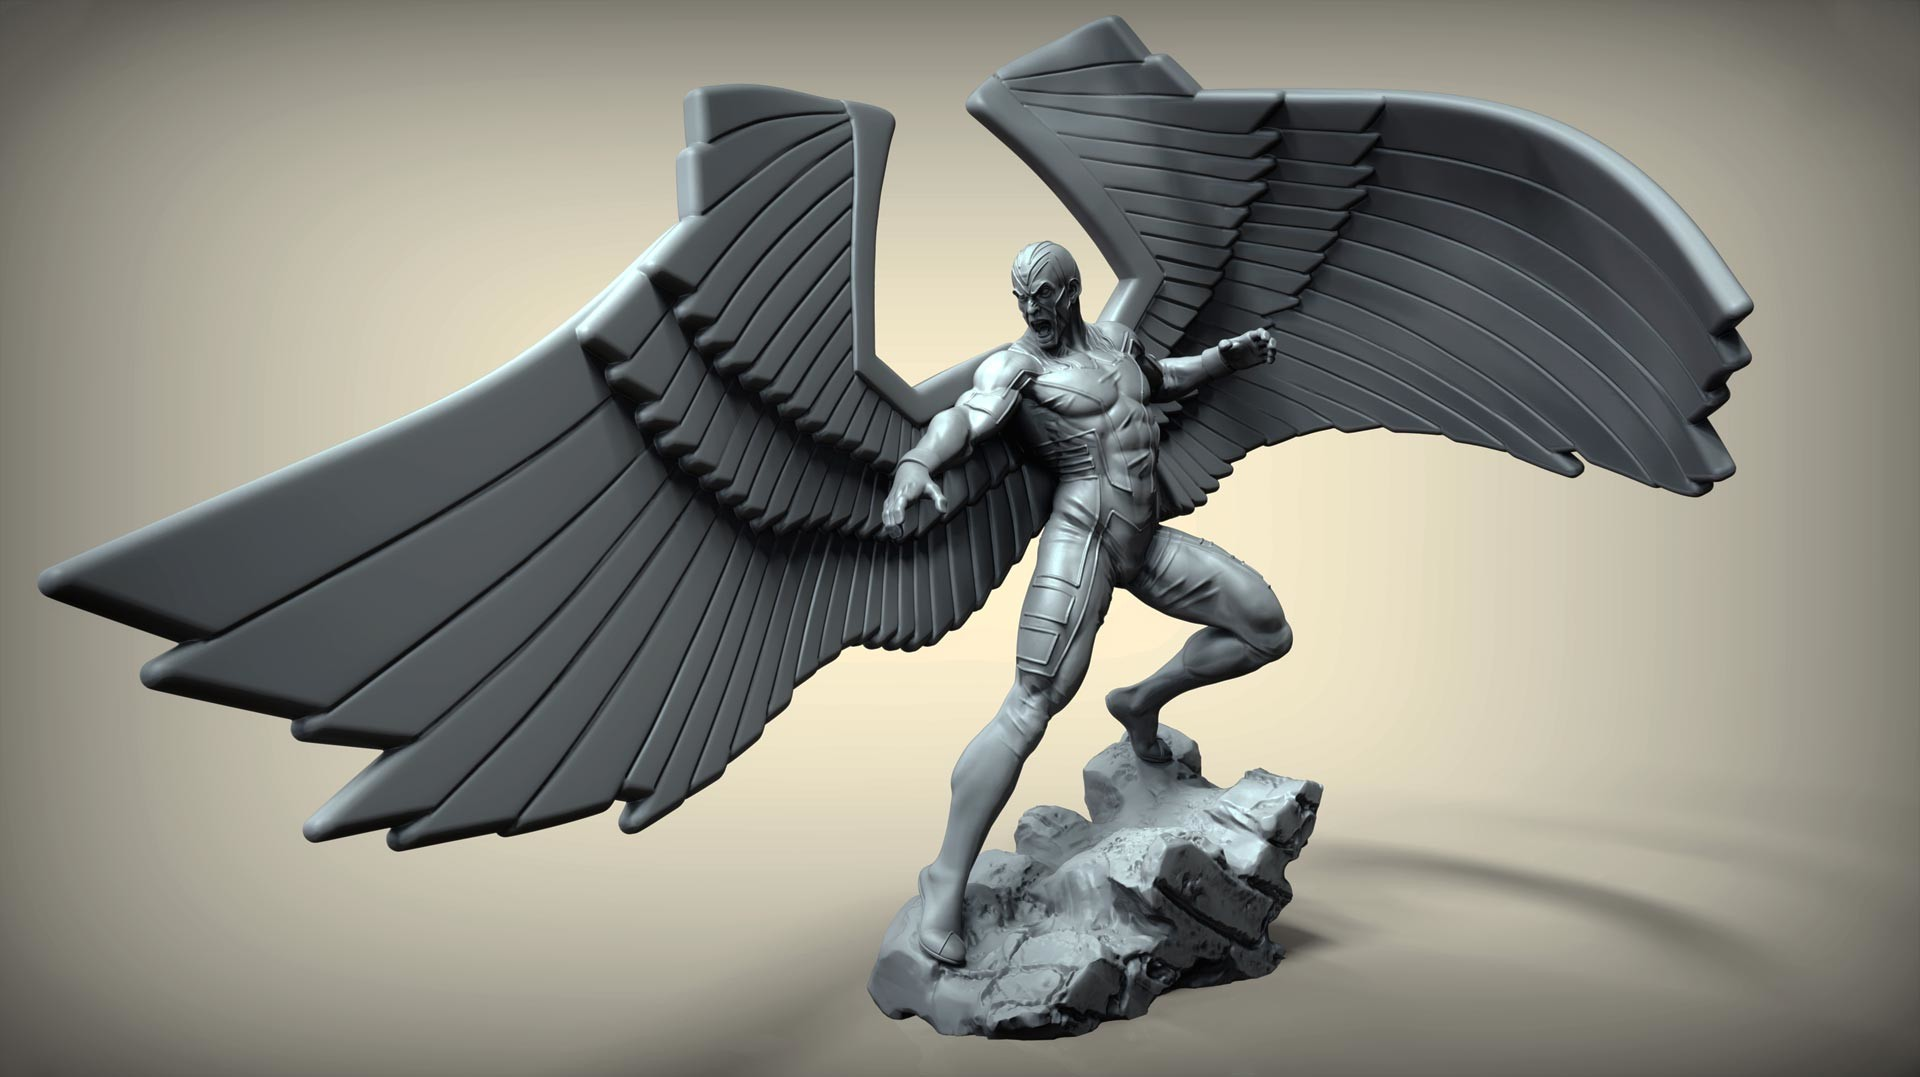 Andre de souza archangel 1